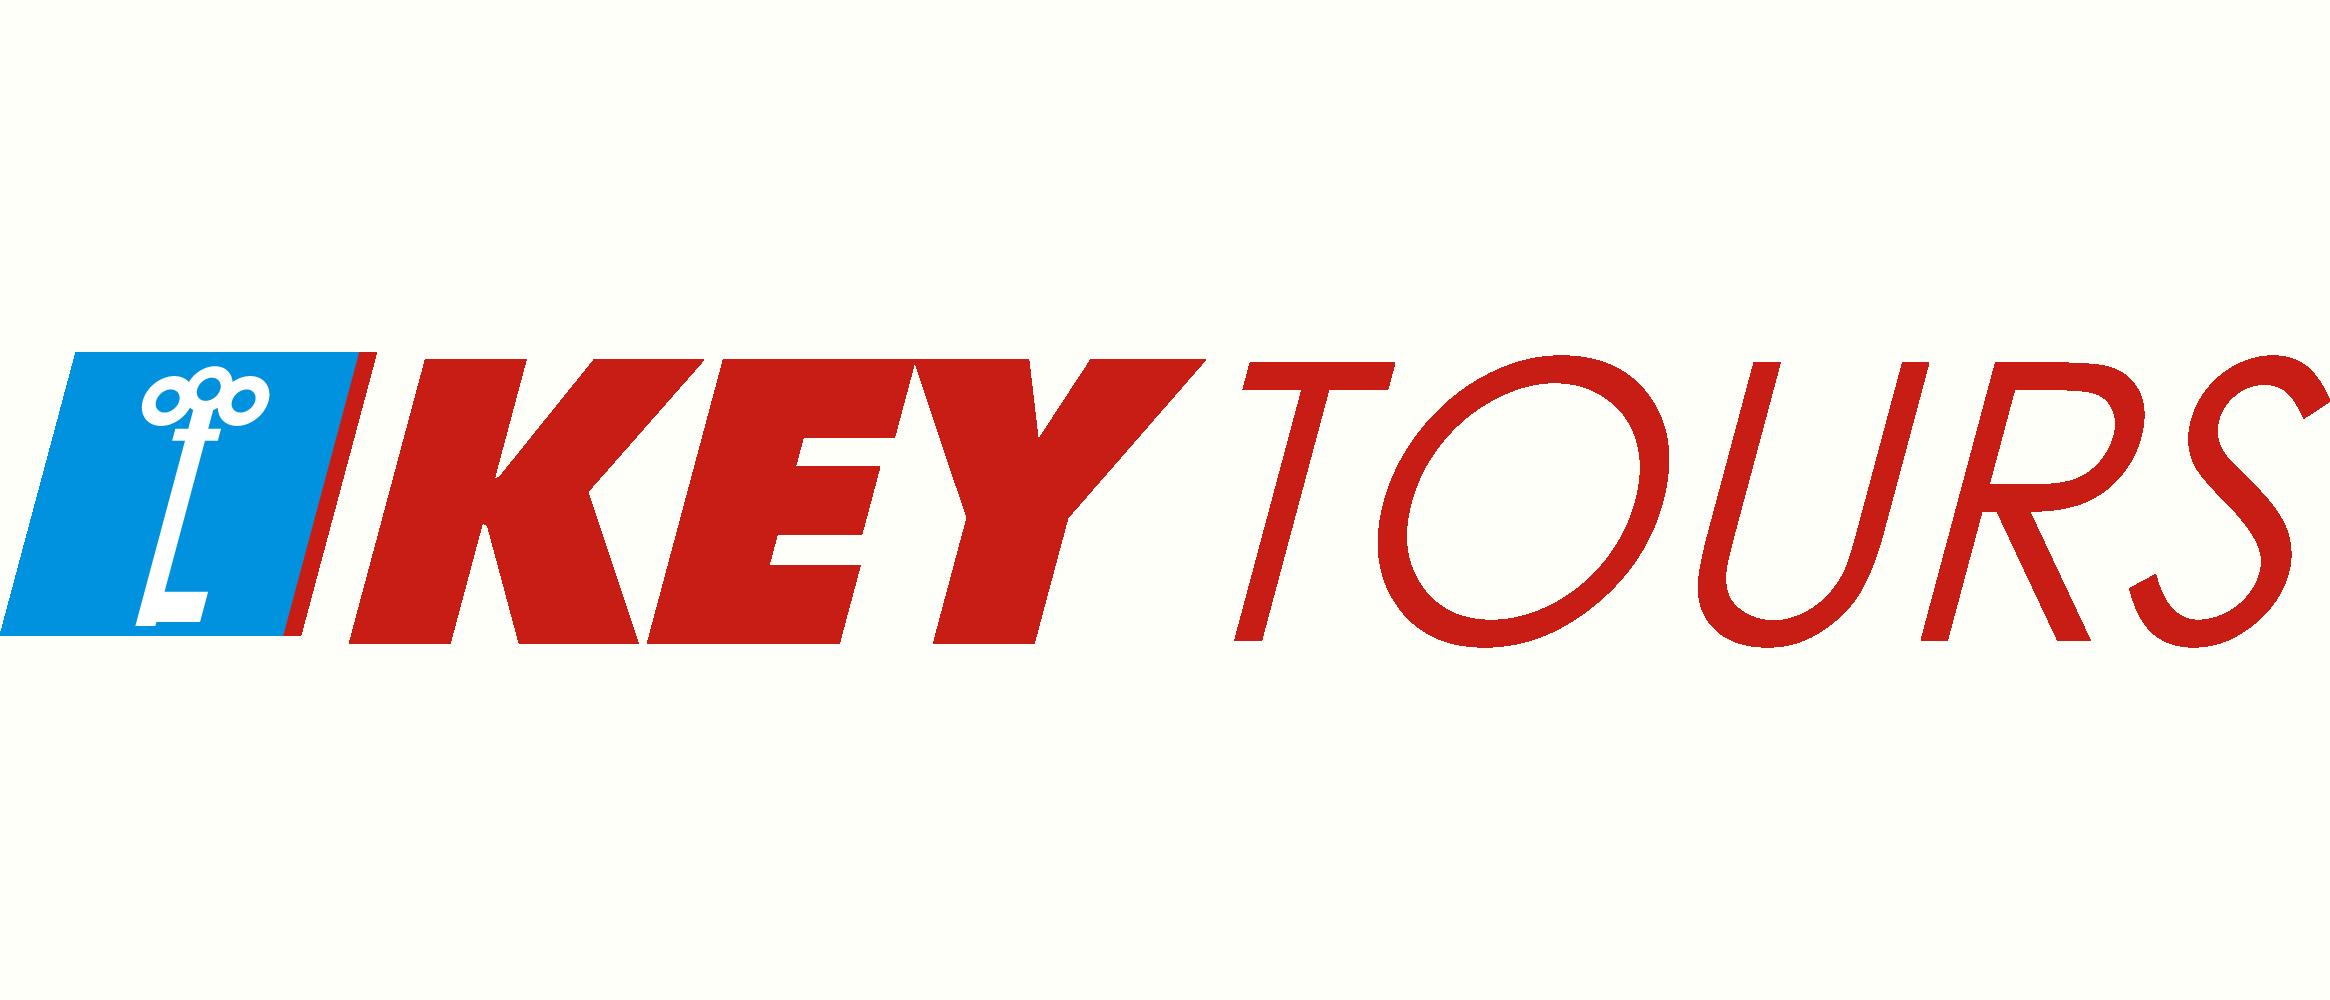 15% Off at Key Tours at Key Tours